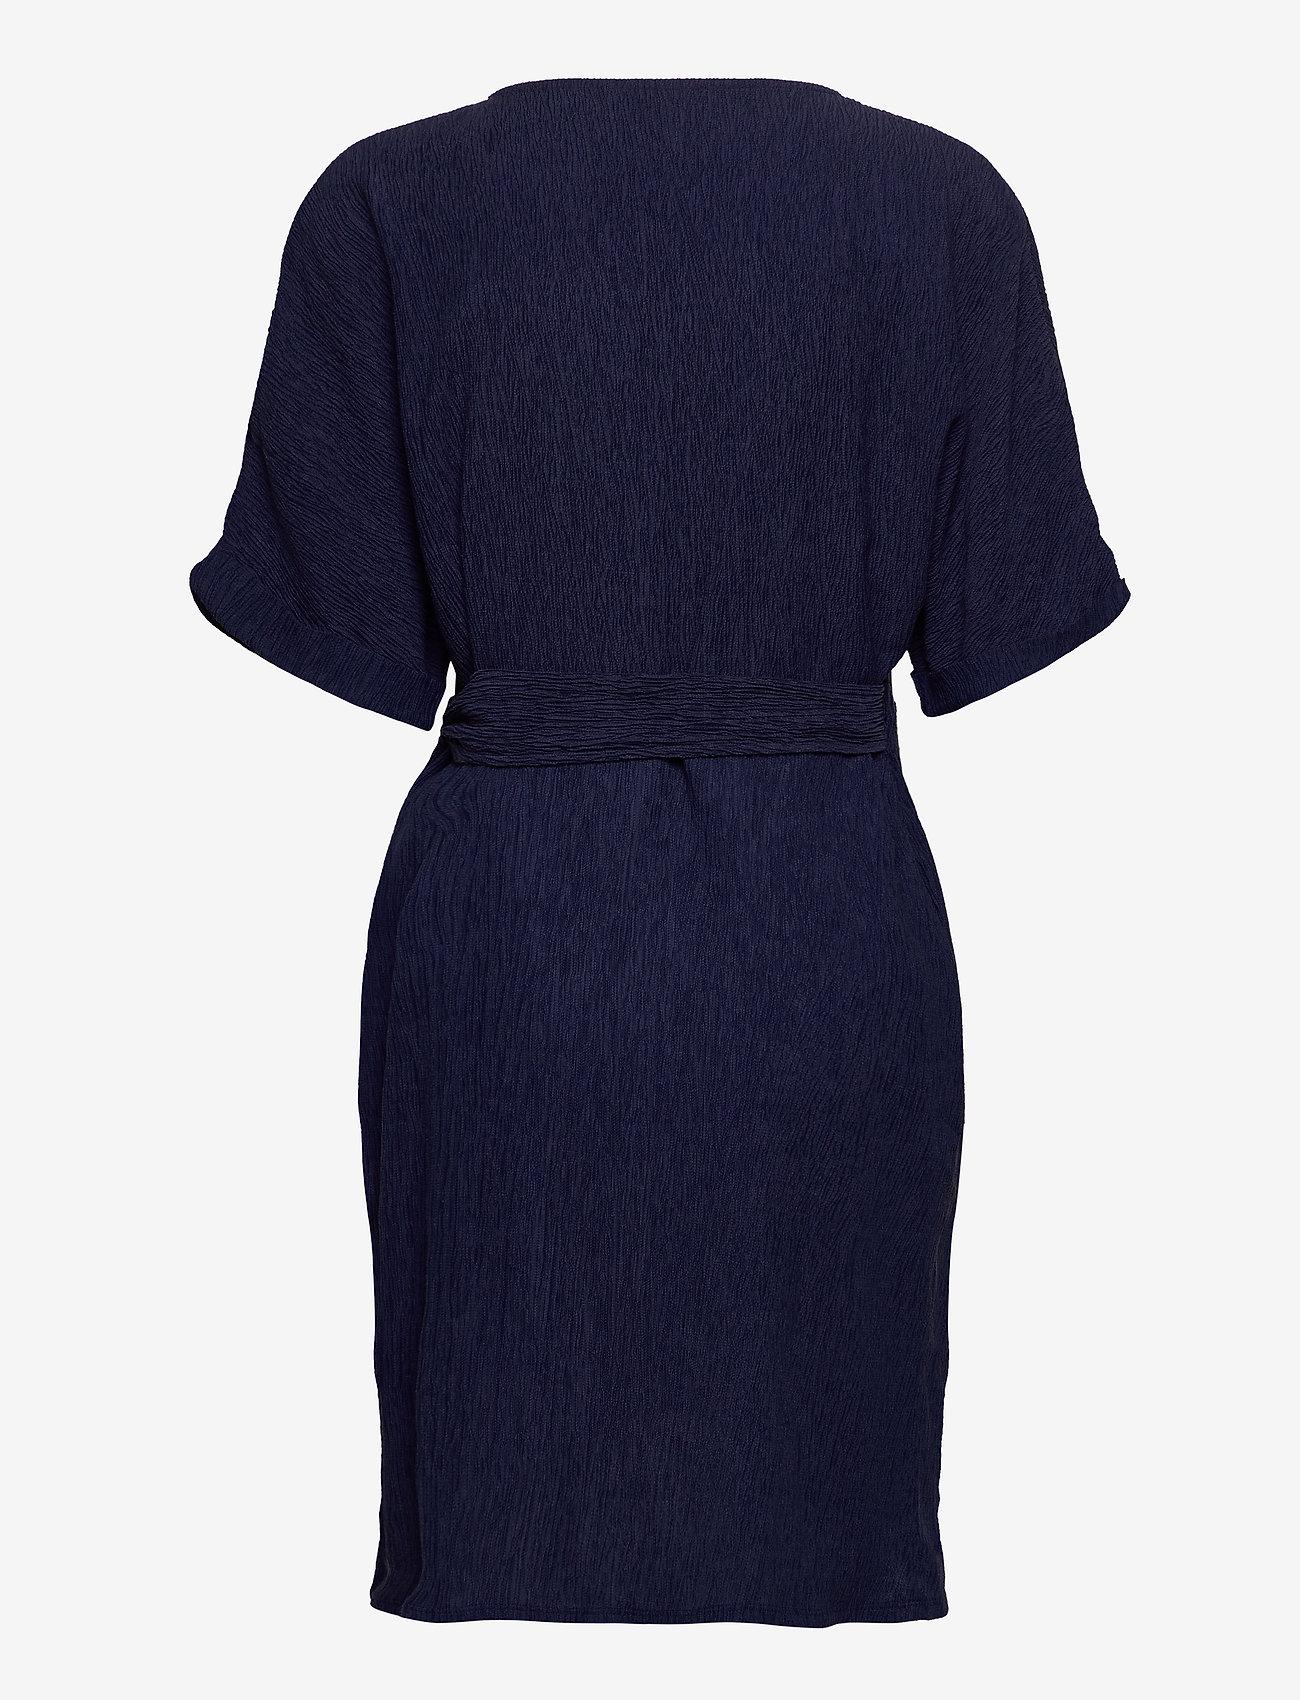 Lindex - Tunic Lisa - tuniques - dark dusty blue - 1